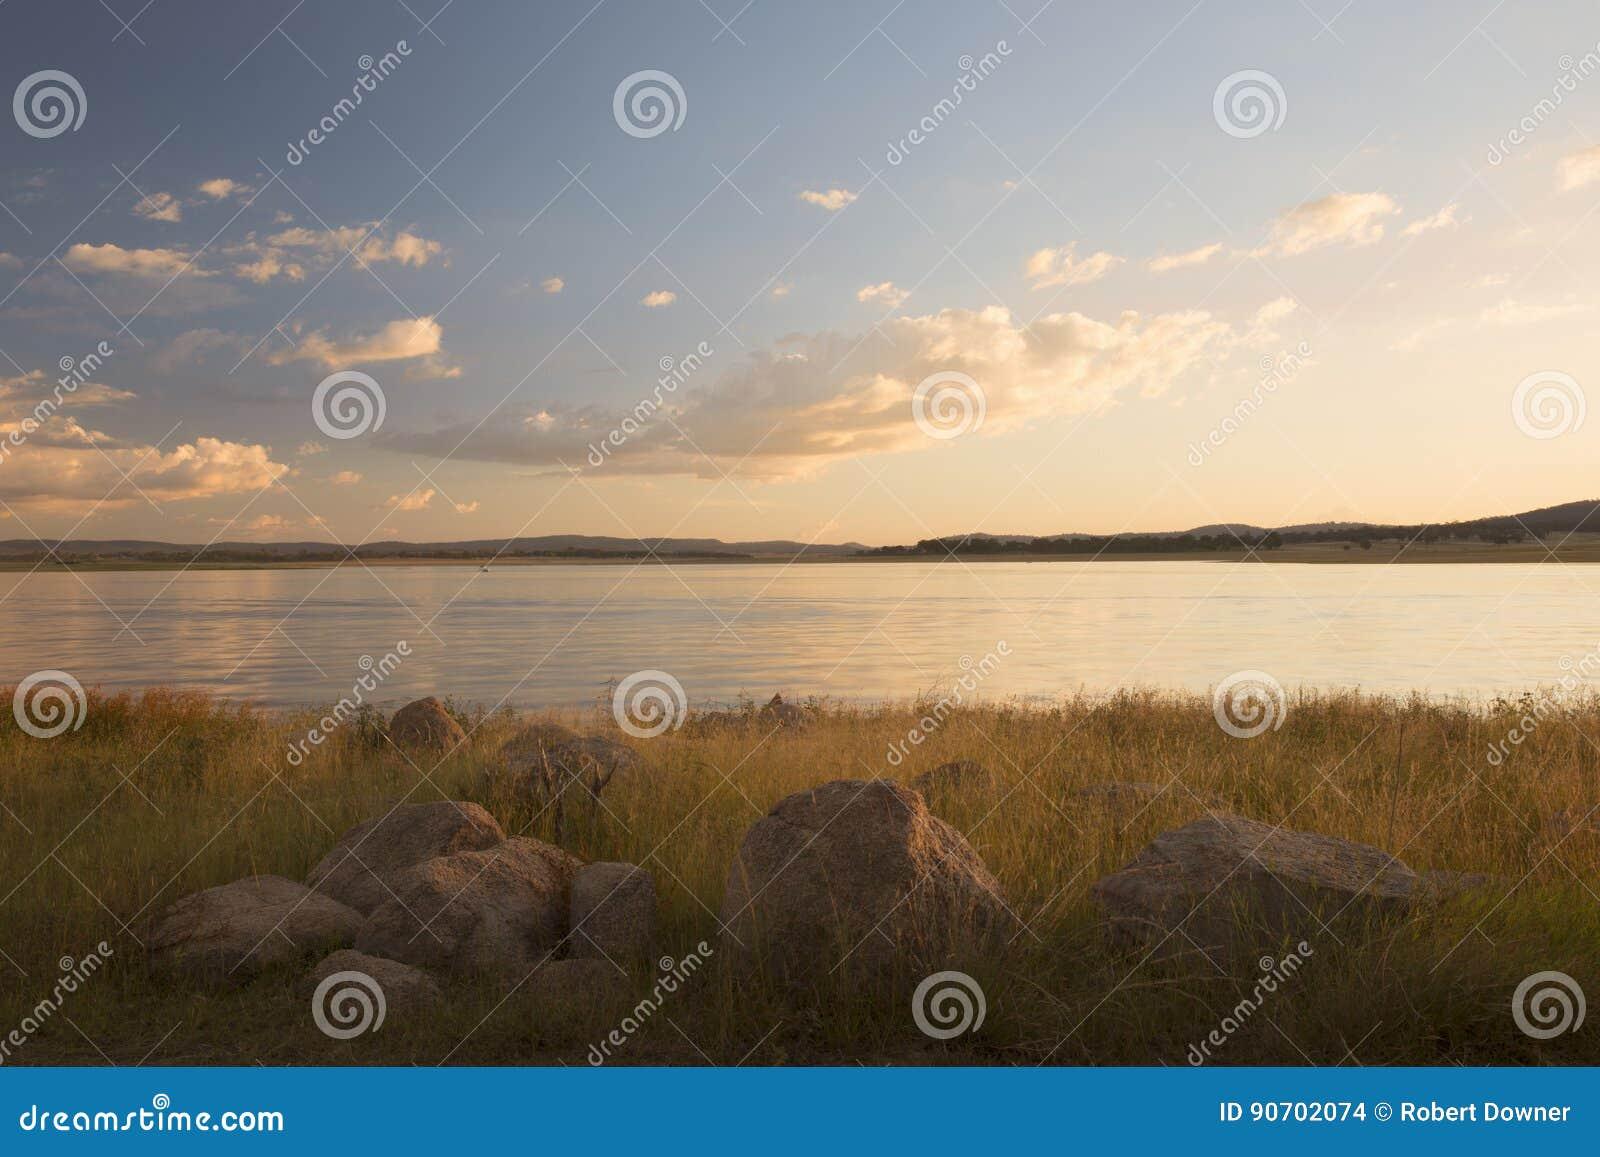 Lake Leslie in Queensland